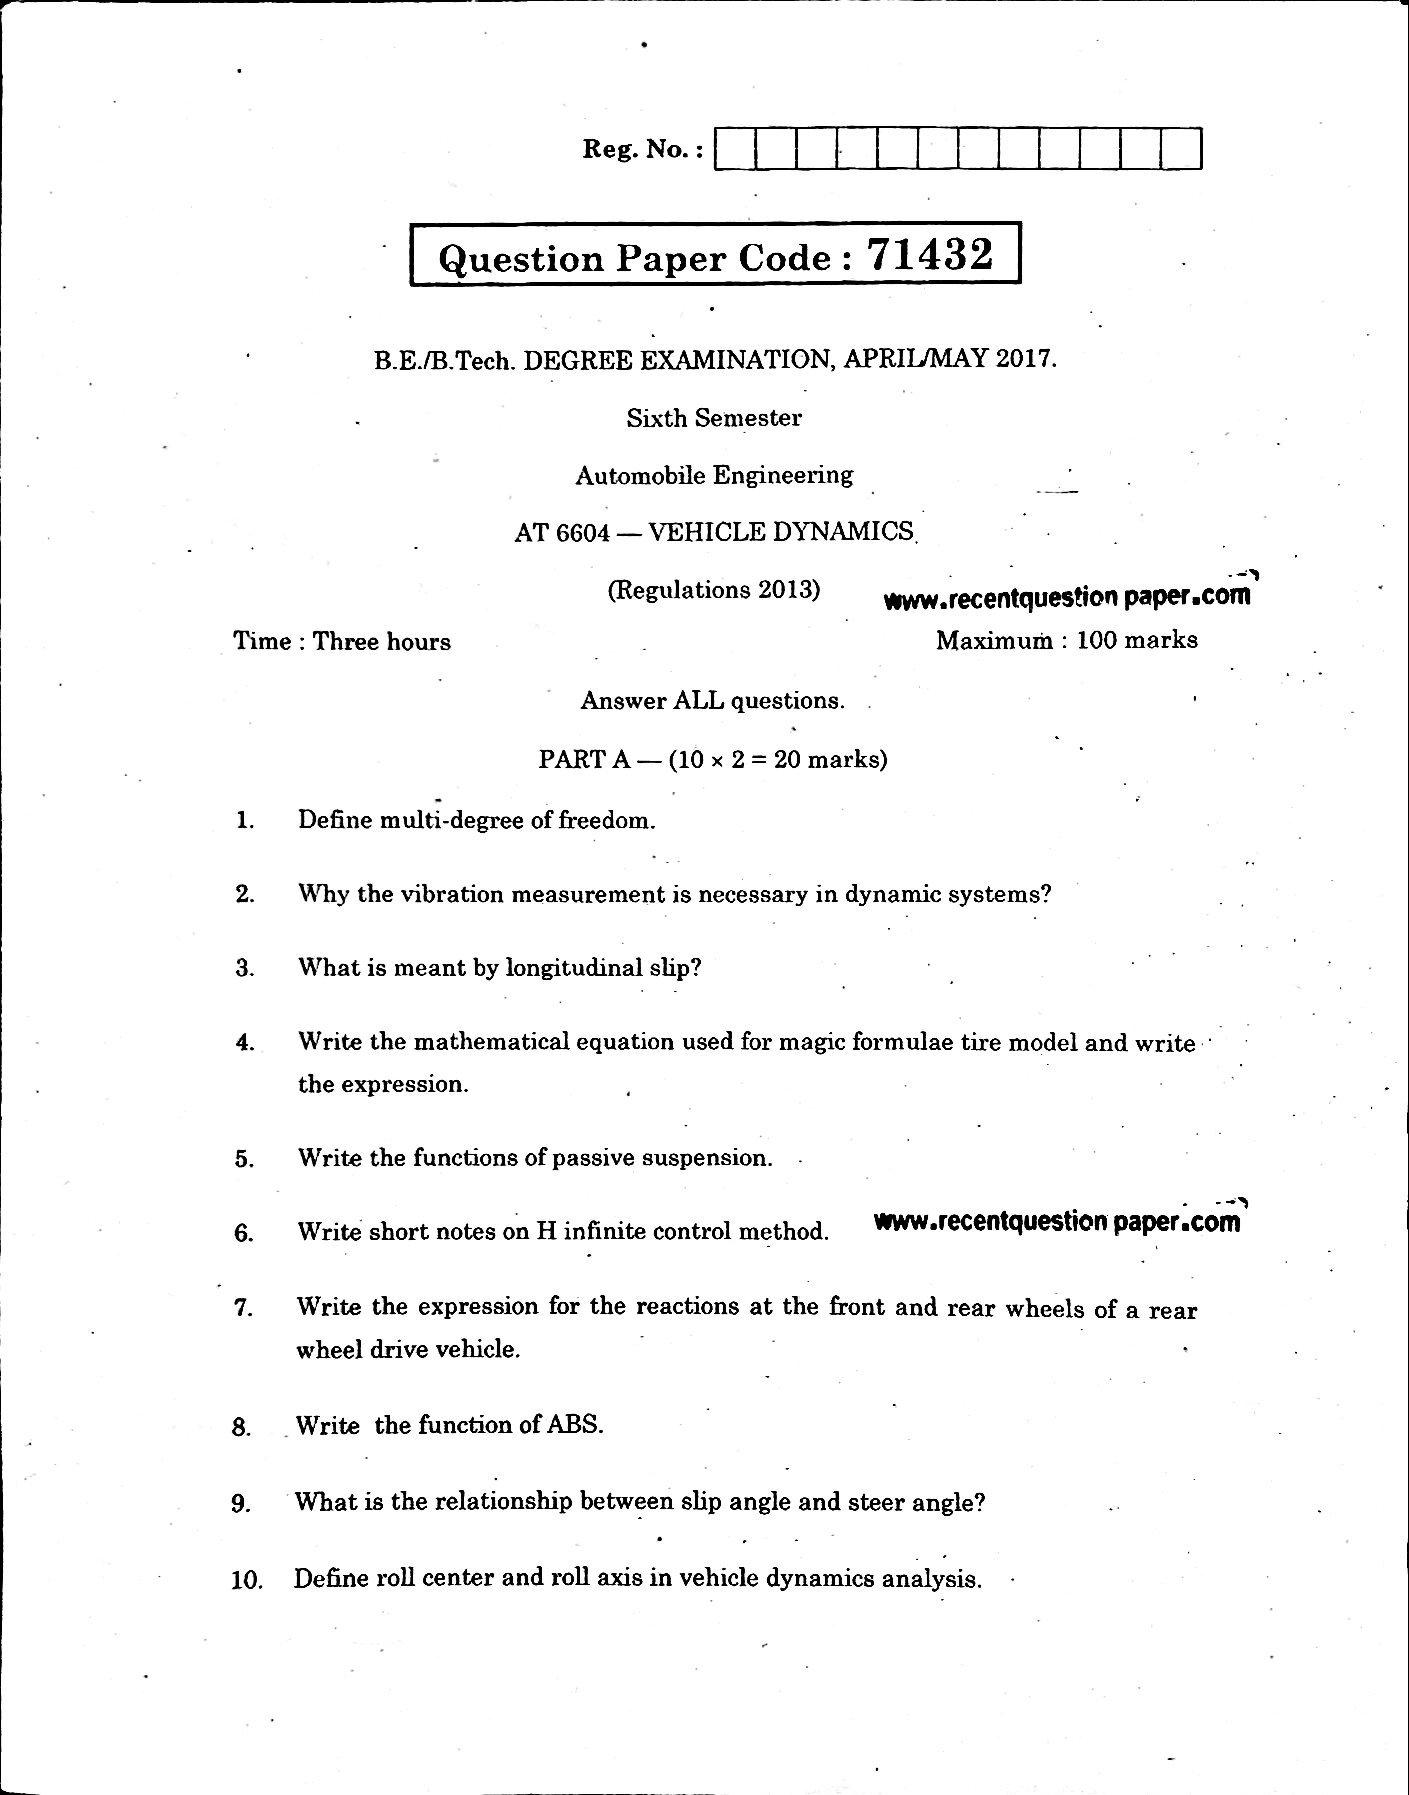 AT6604 Vehicle Dynamics AprilMay 2017 - Recent Question Paper